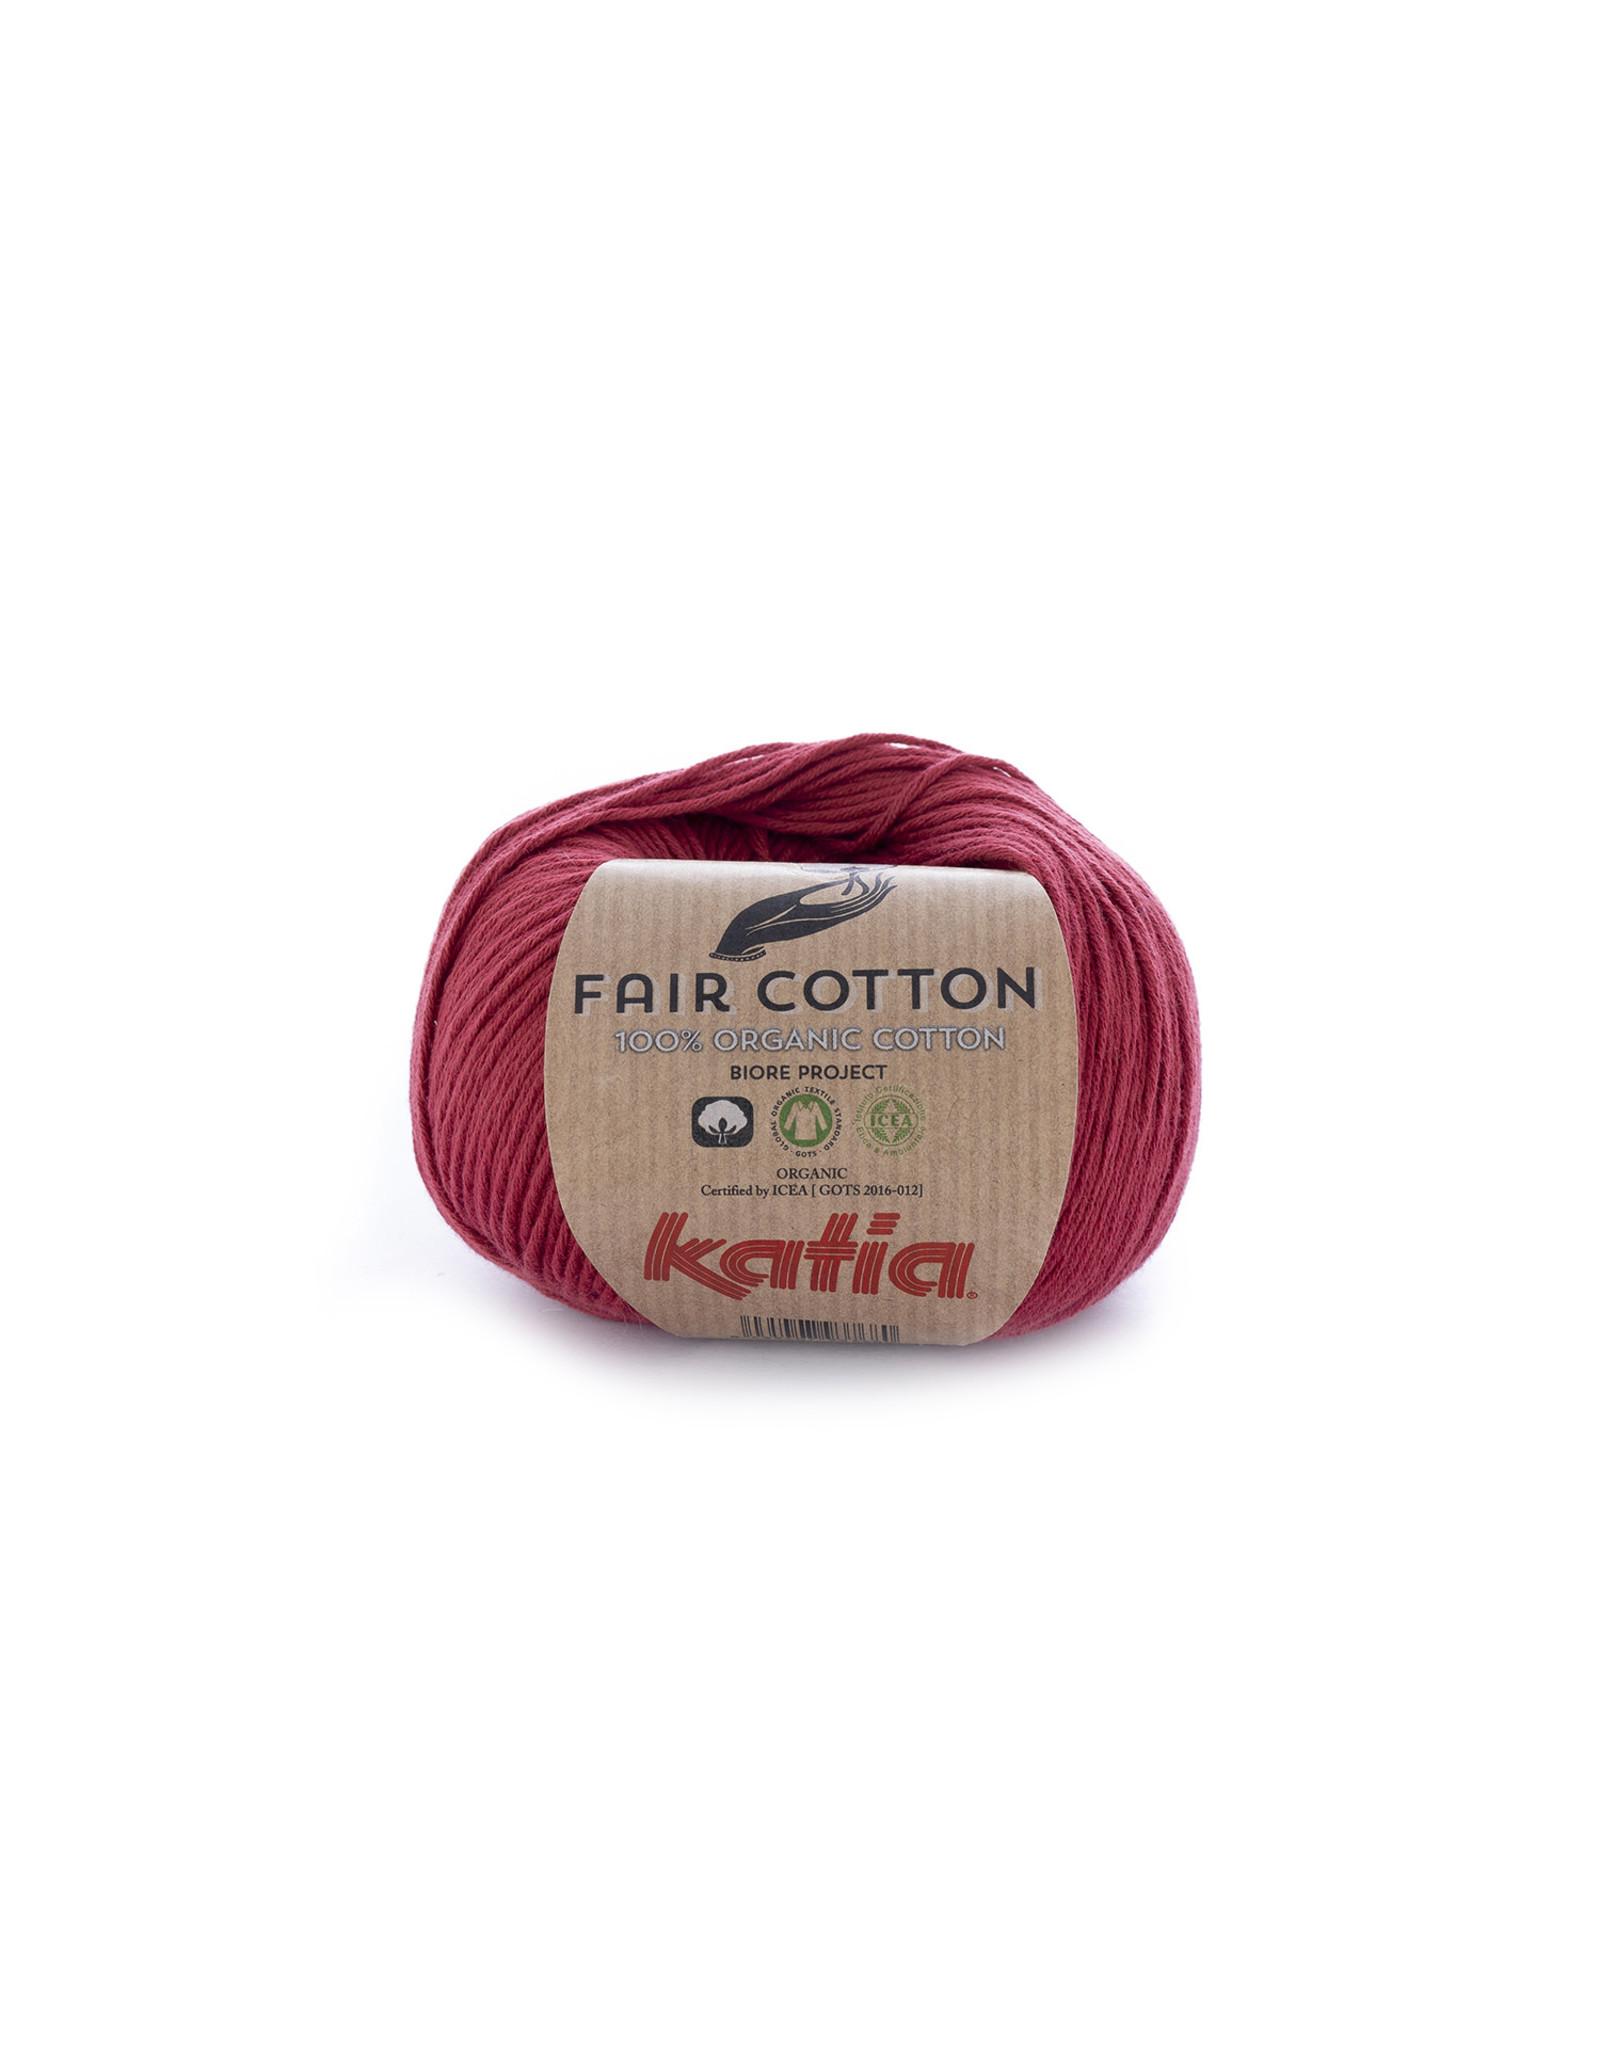 Katia Katia Fair Cotton 27 - wijnrood - 50 gr. - 100% biol. katoen